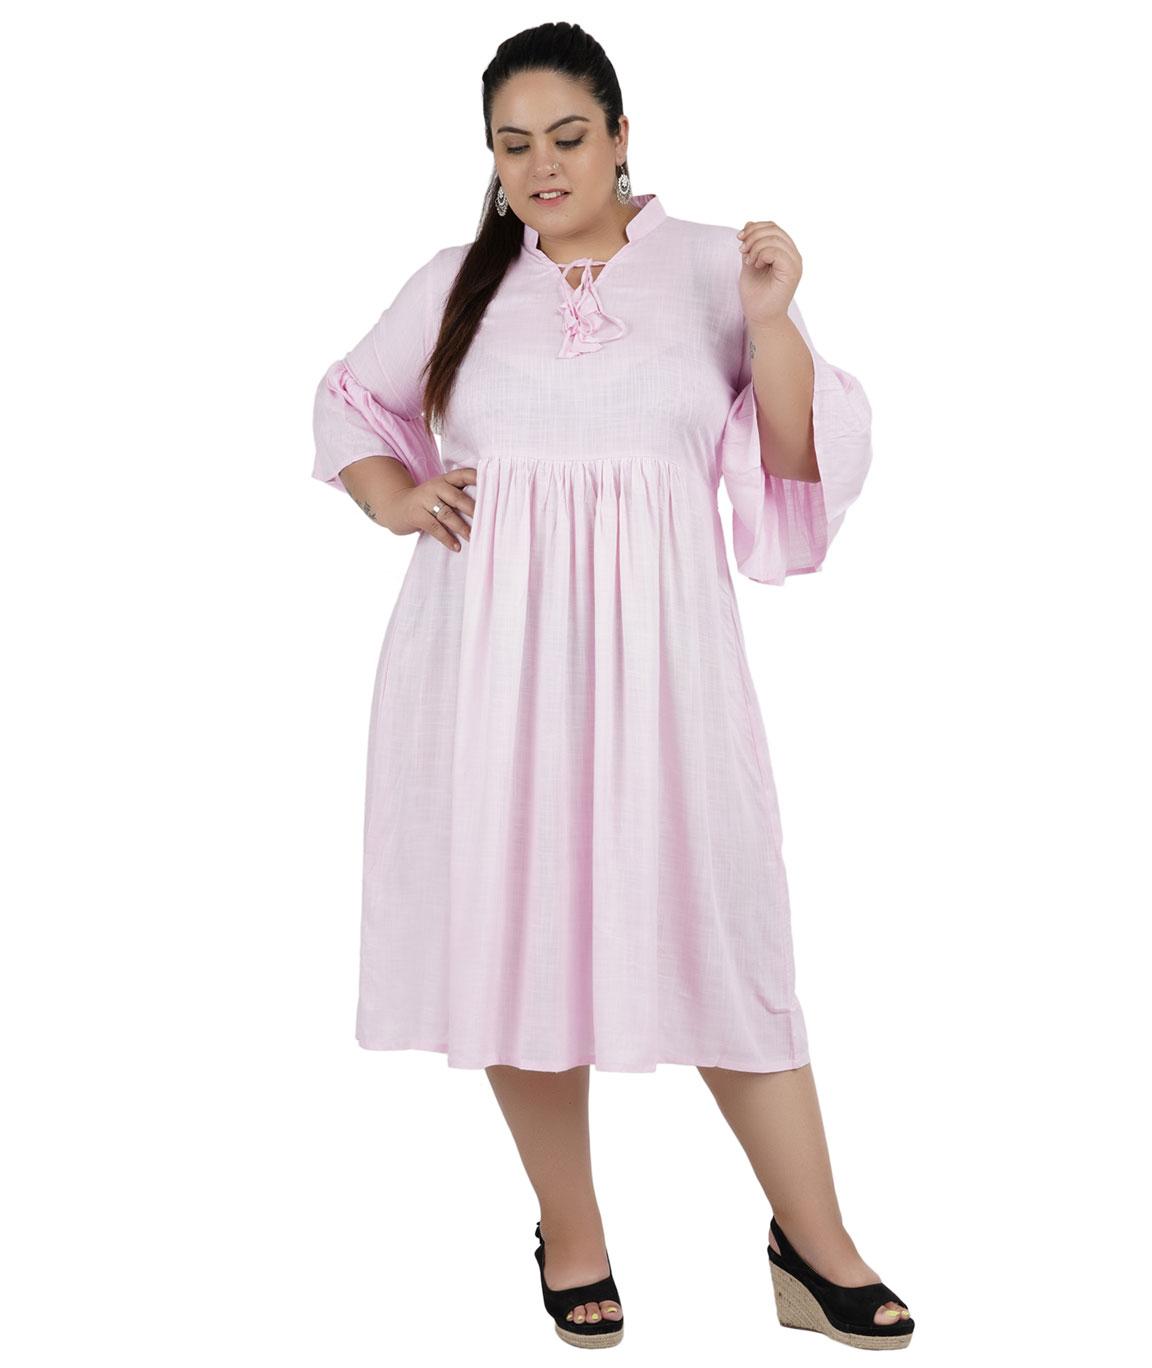 FAZZN Rayon Dresses For Women`s(Pink)